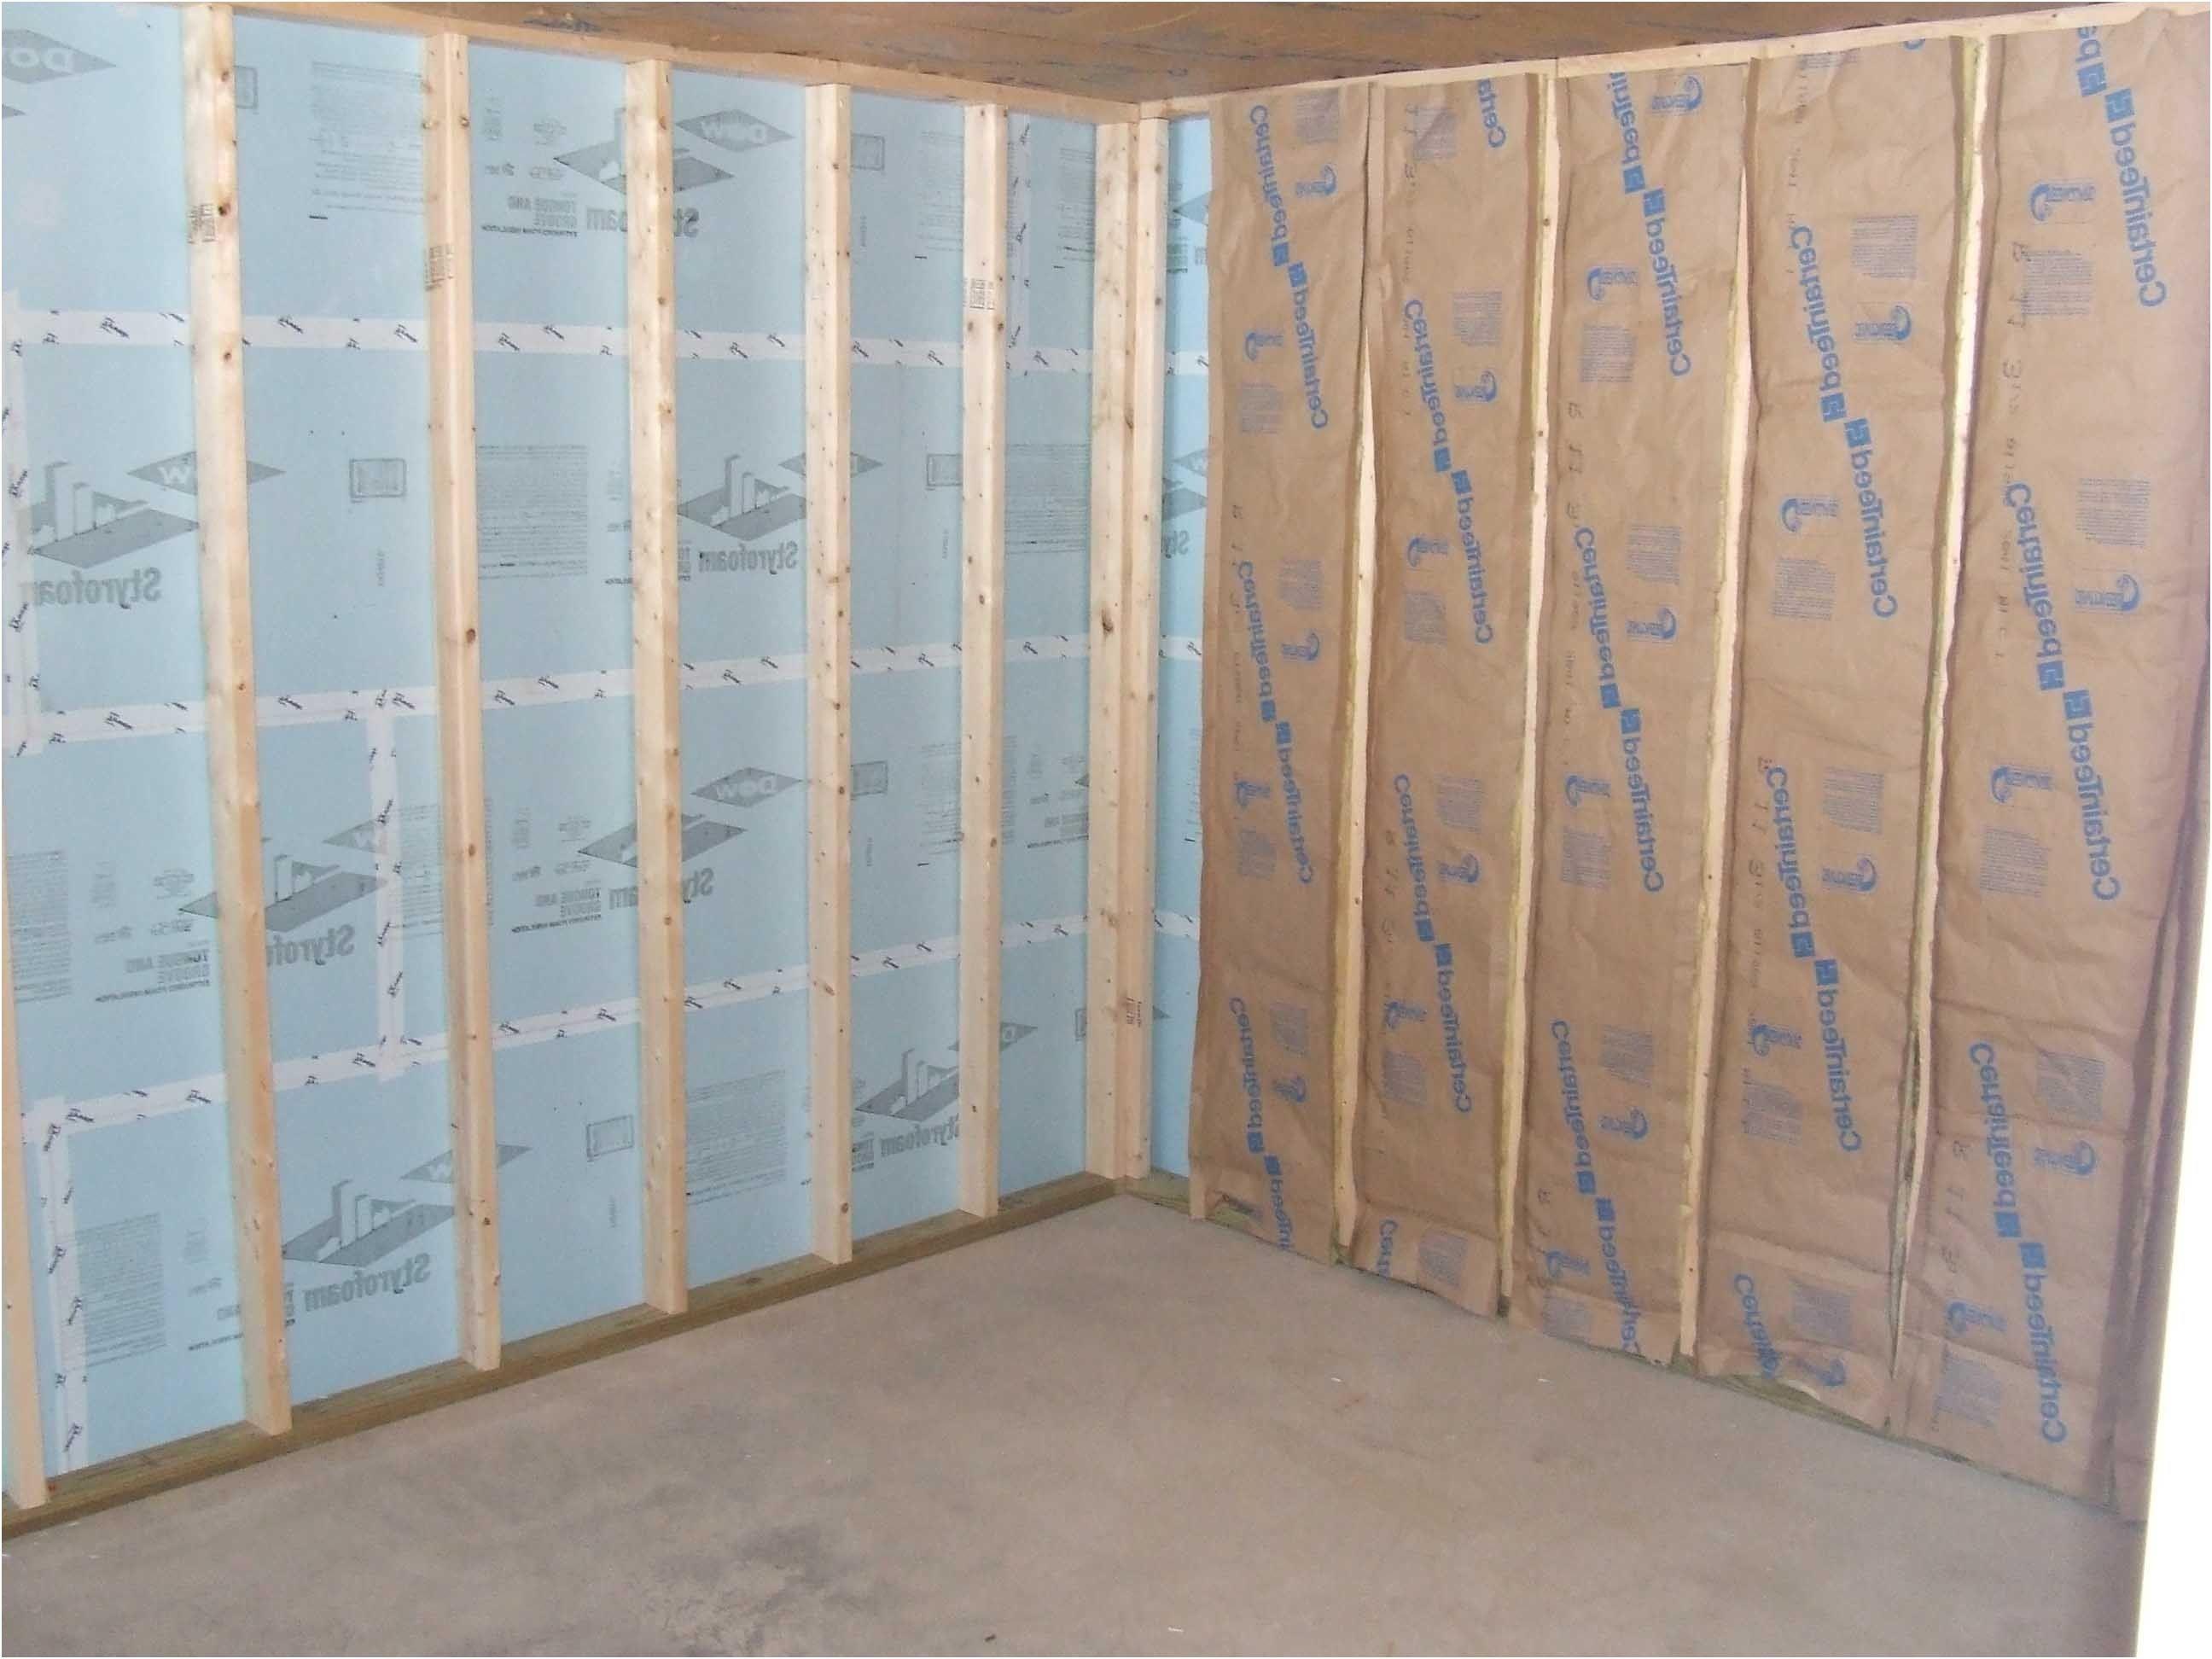 Best Methods For Insulating Basement Walls From How To Insulate Concrete Basement Walls Insulating Basement Walls Basement Insulation Basement Walls